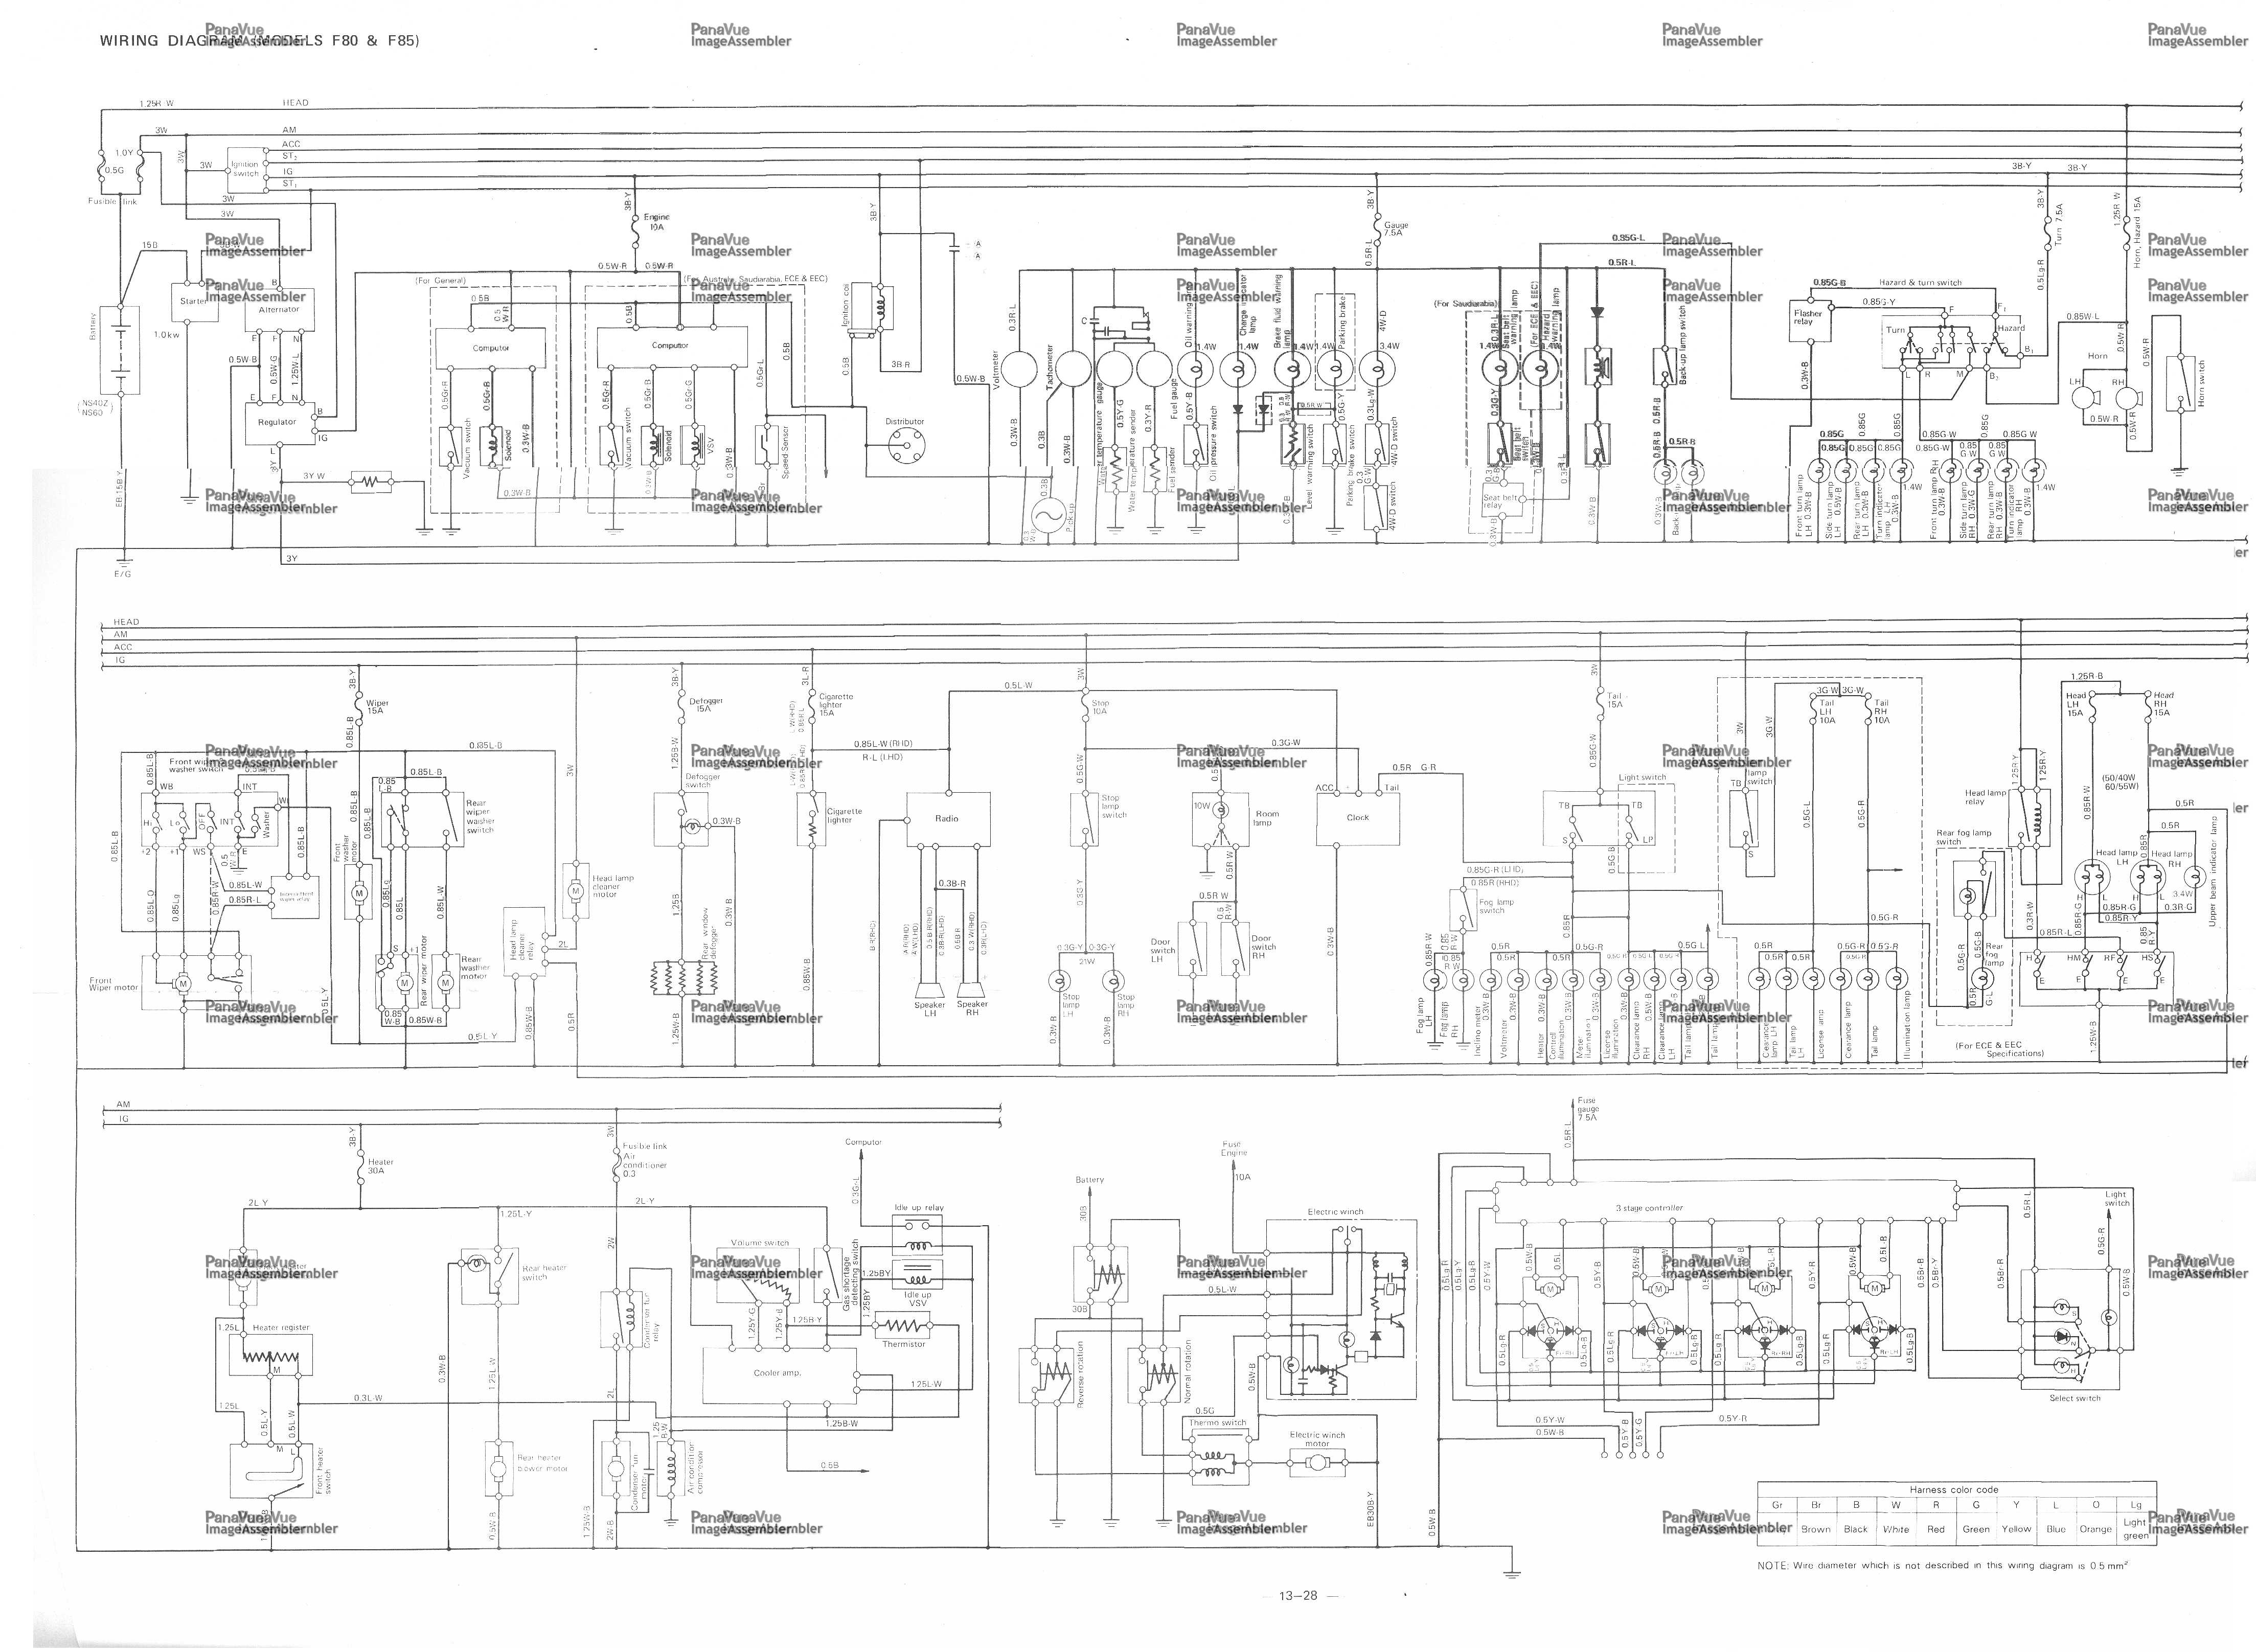 wiring diagram daihatsu mira l6 electrical drawing wiring diagram u2022 rh asuransiallianz co 3-Way Switch Wiring Diagram Automotive Wiring Diagrams